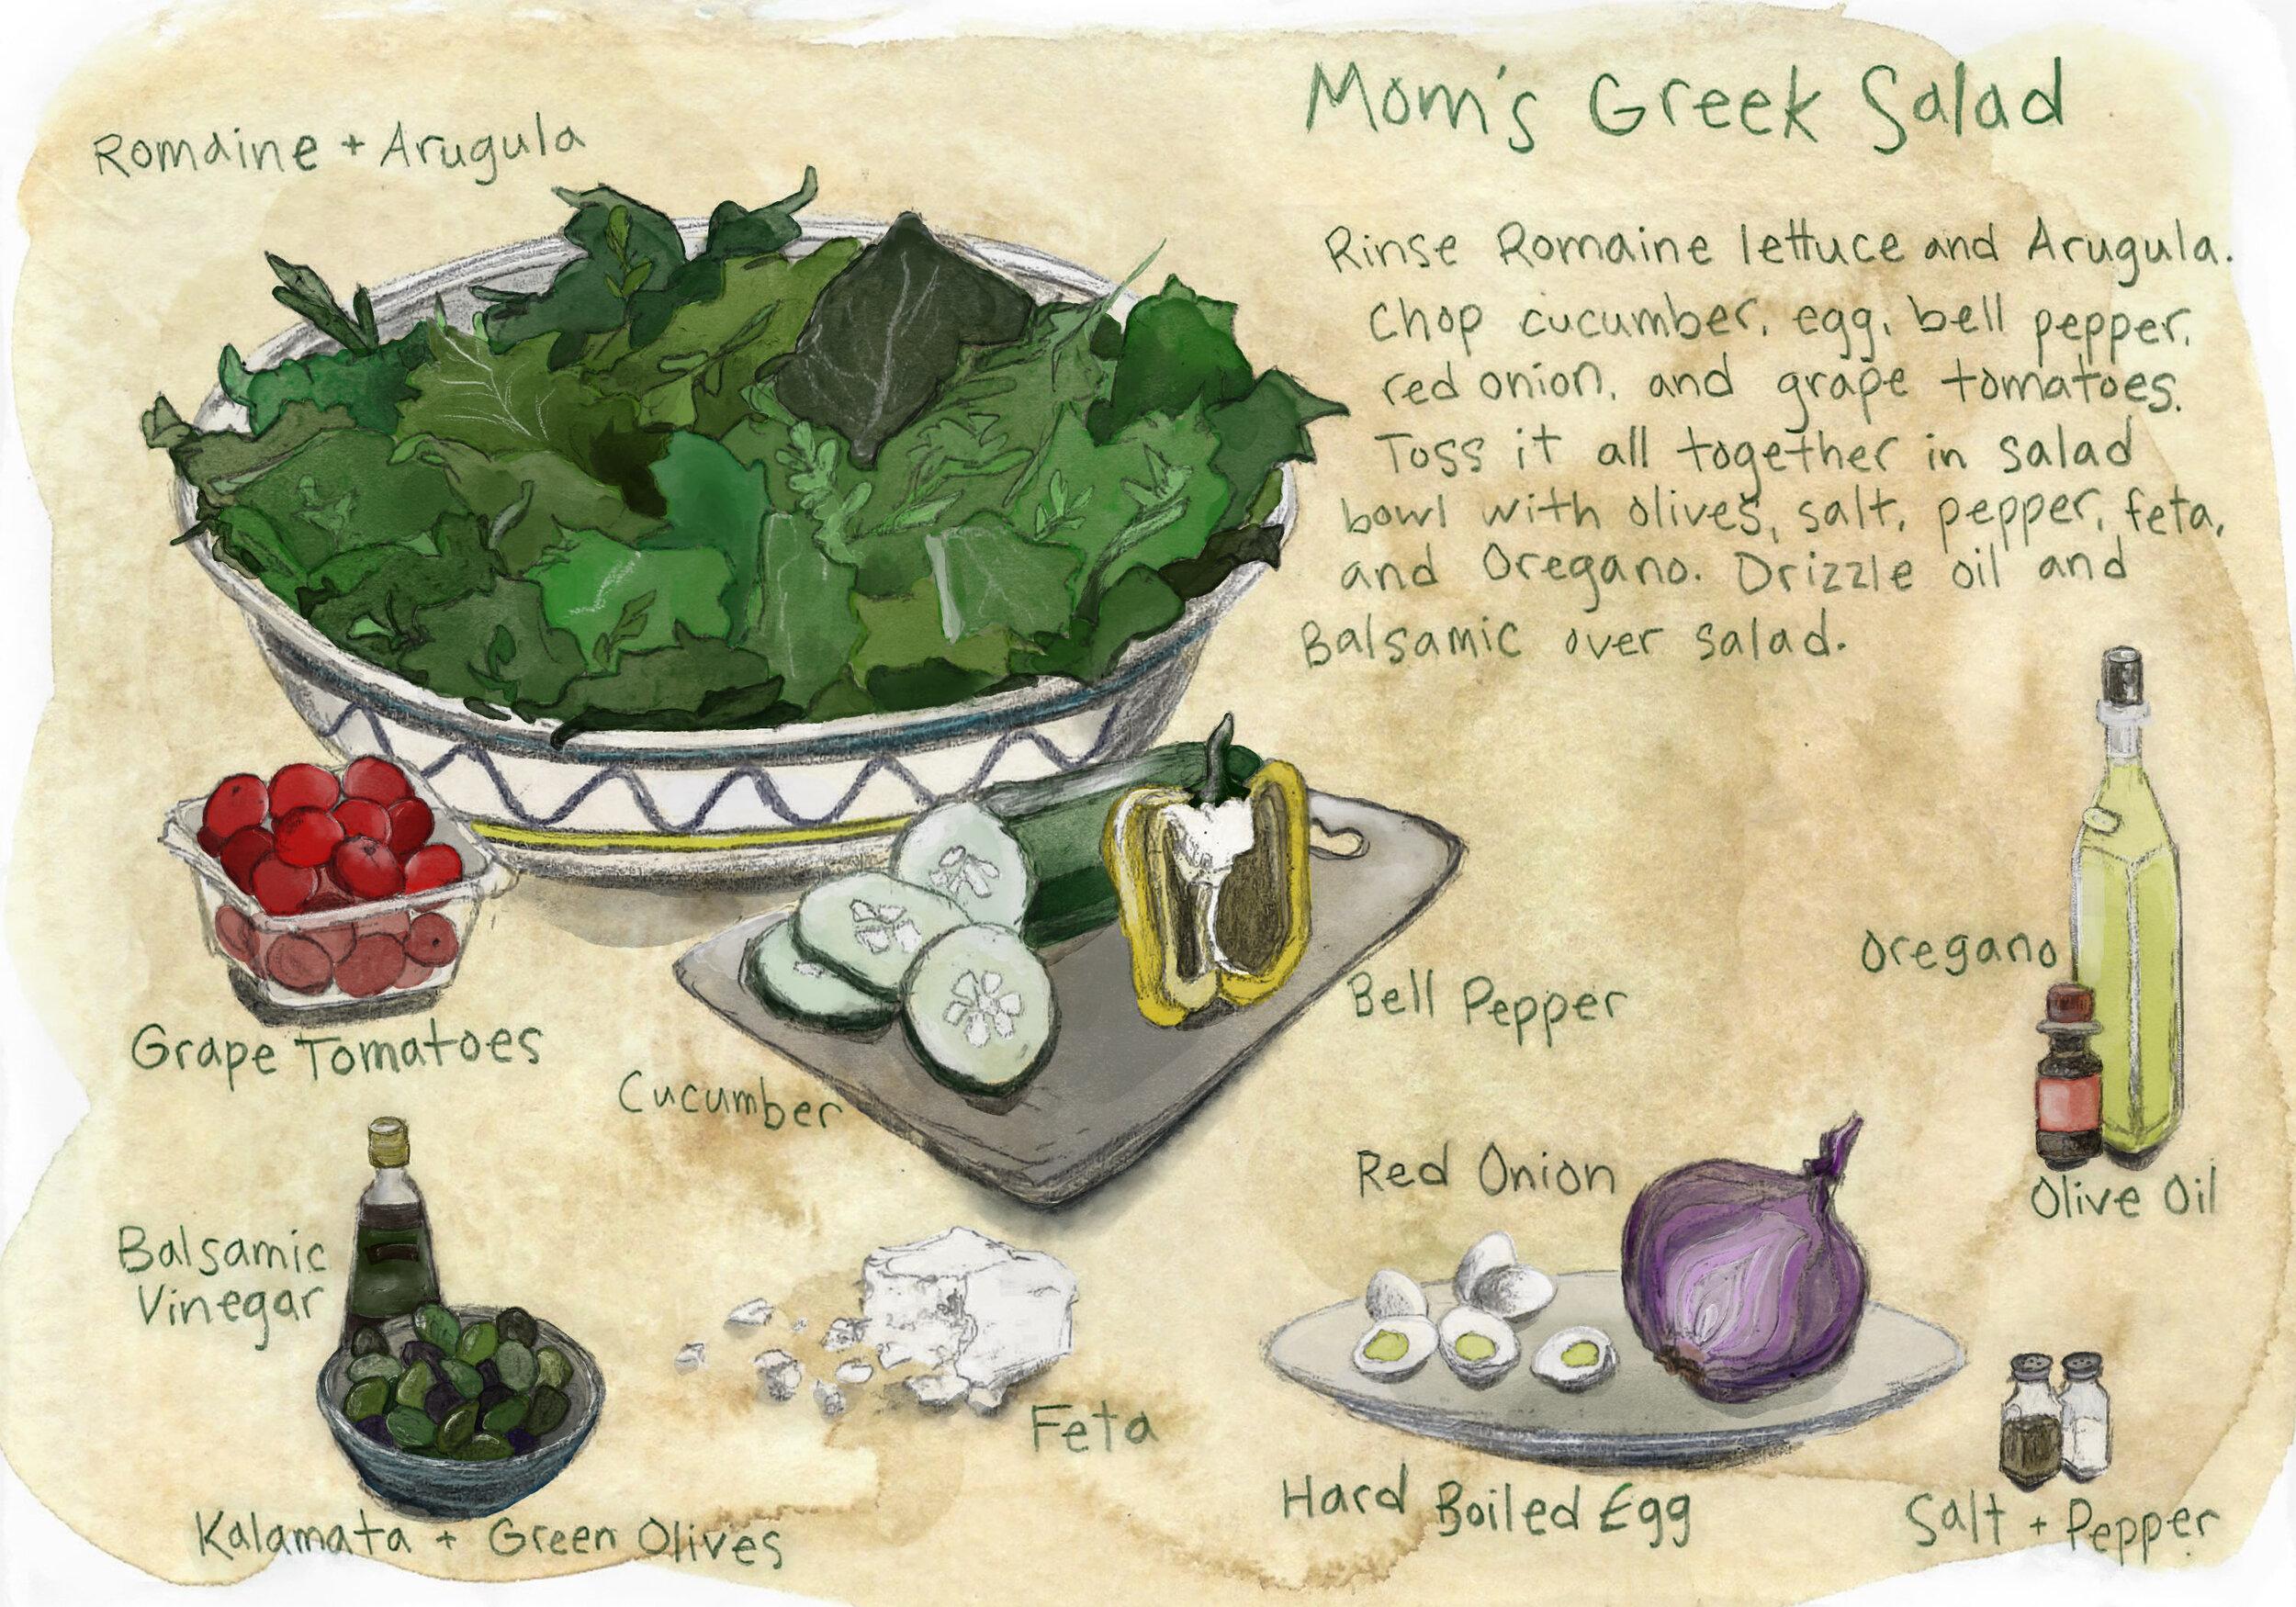 Mom's Greek Salad Recipe